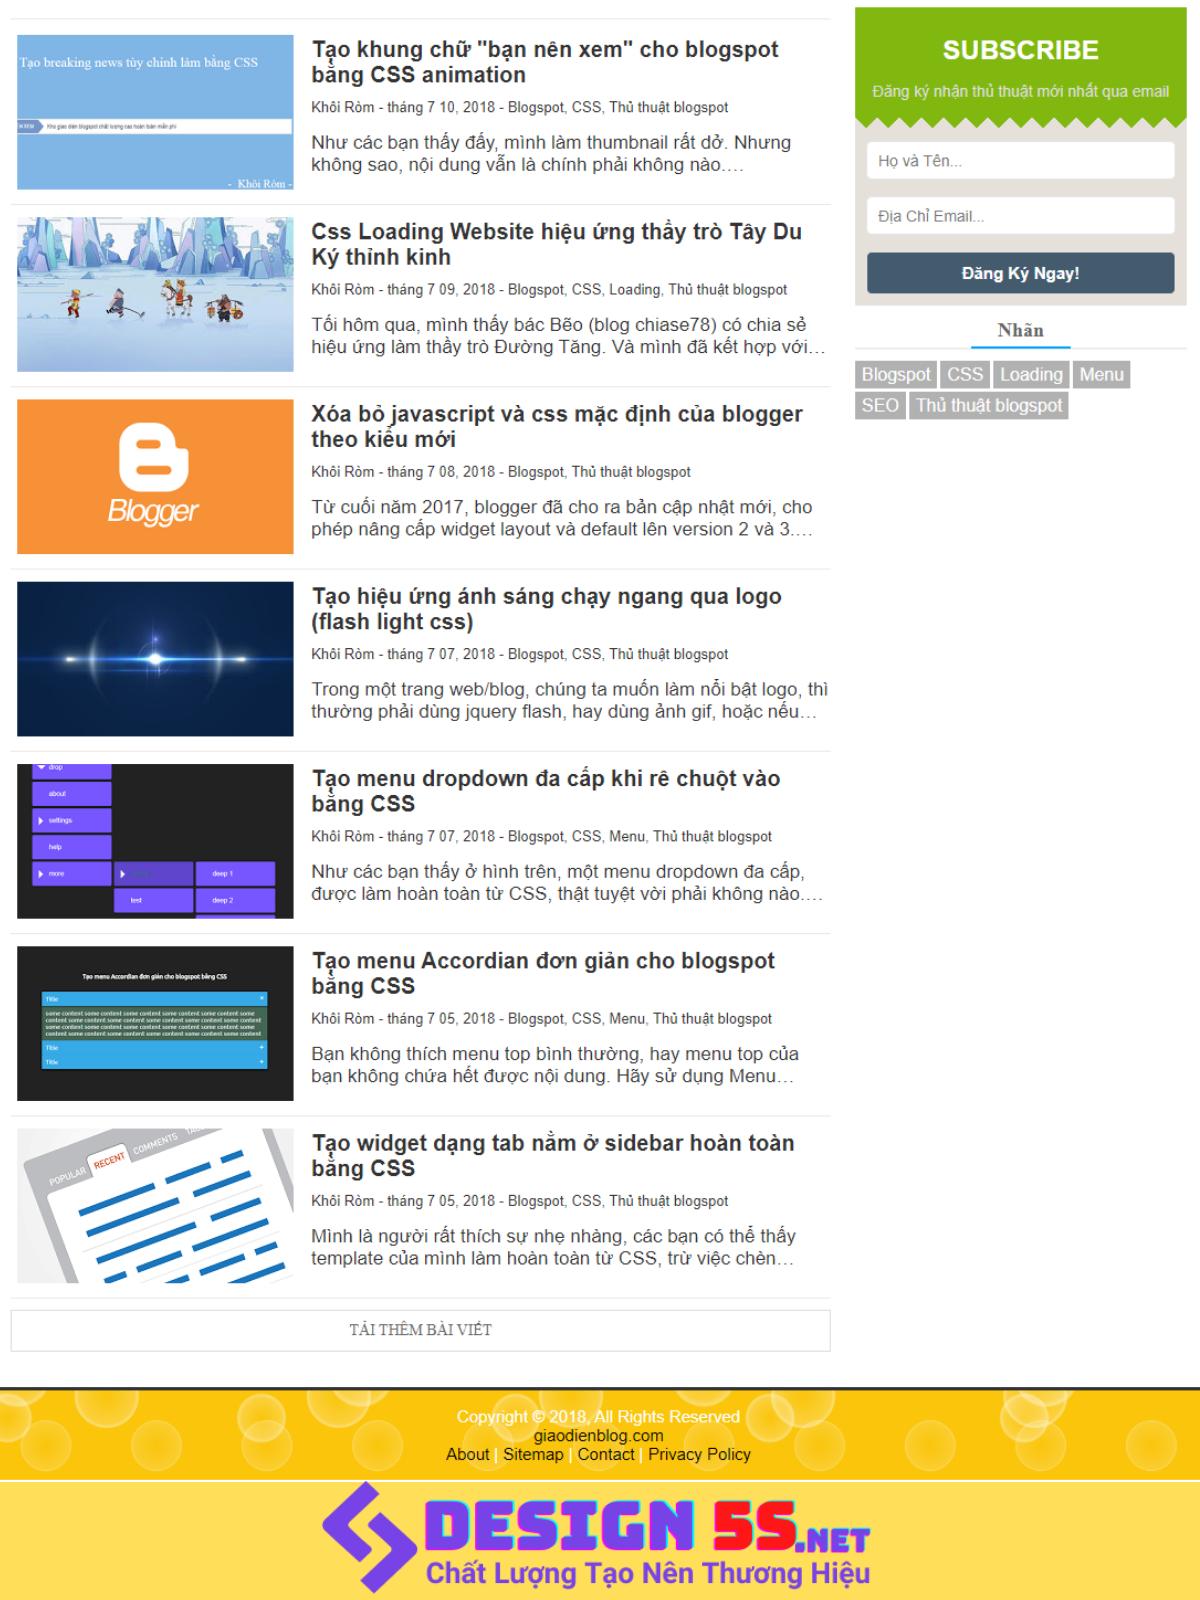 Super Fast Load Bloggger Template v2.0, Tải Nhanh - Ảnh 2